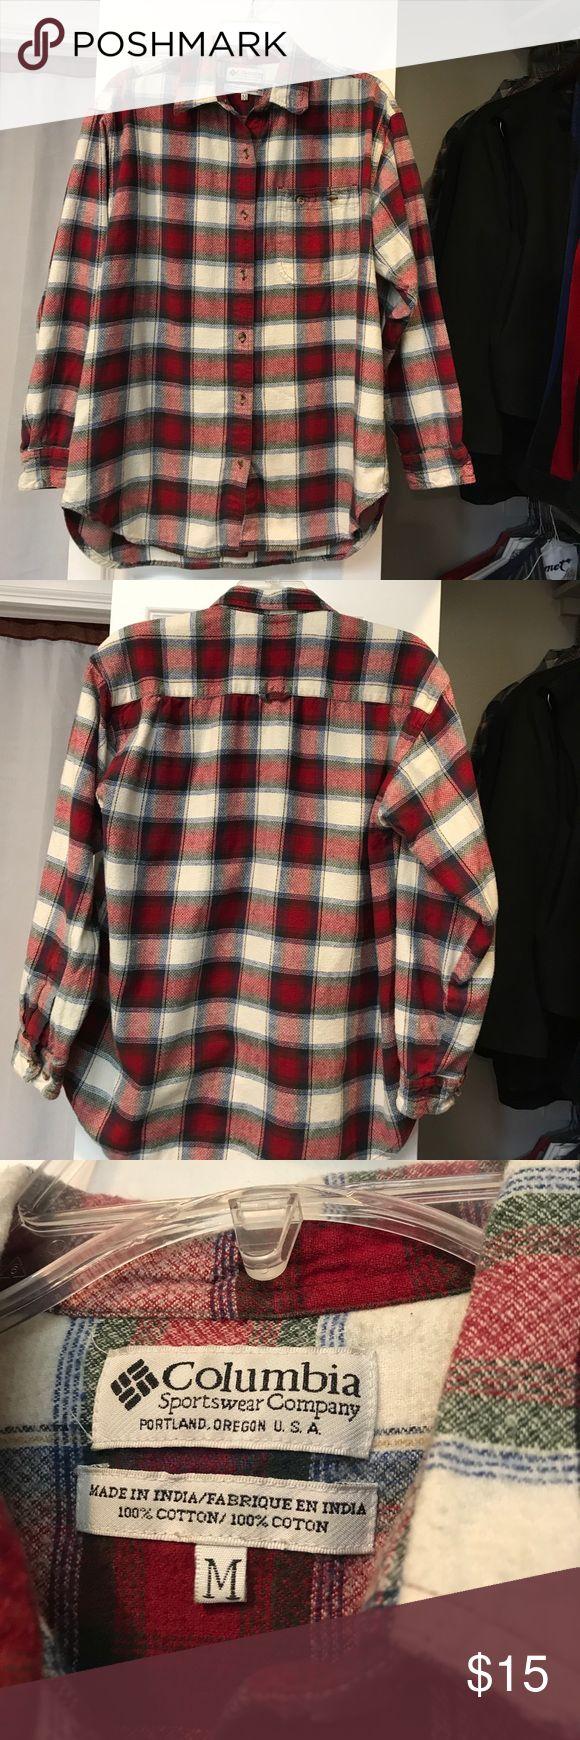 Selling this Columbia Sportswear Company 100% cotton. on Poshmark! My username is: katandrach. #shopmycloset #poshmark #fashion #shopping #style #forsale #Columbia #Tops